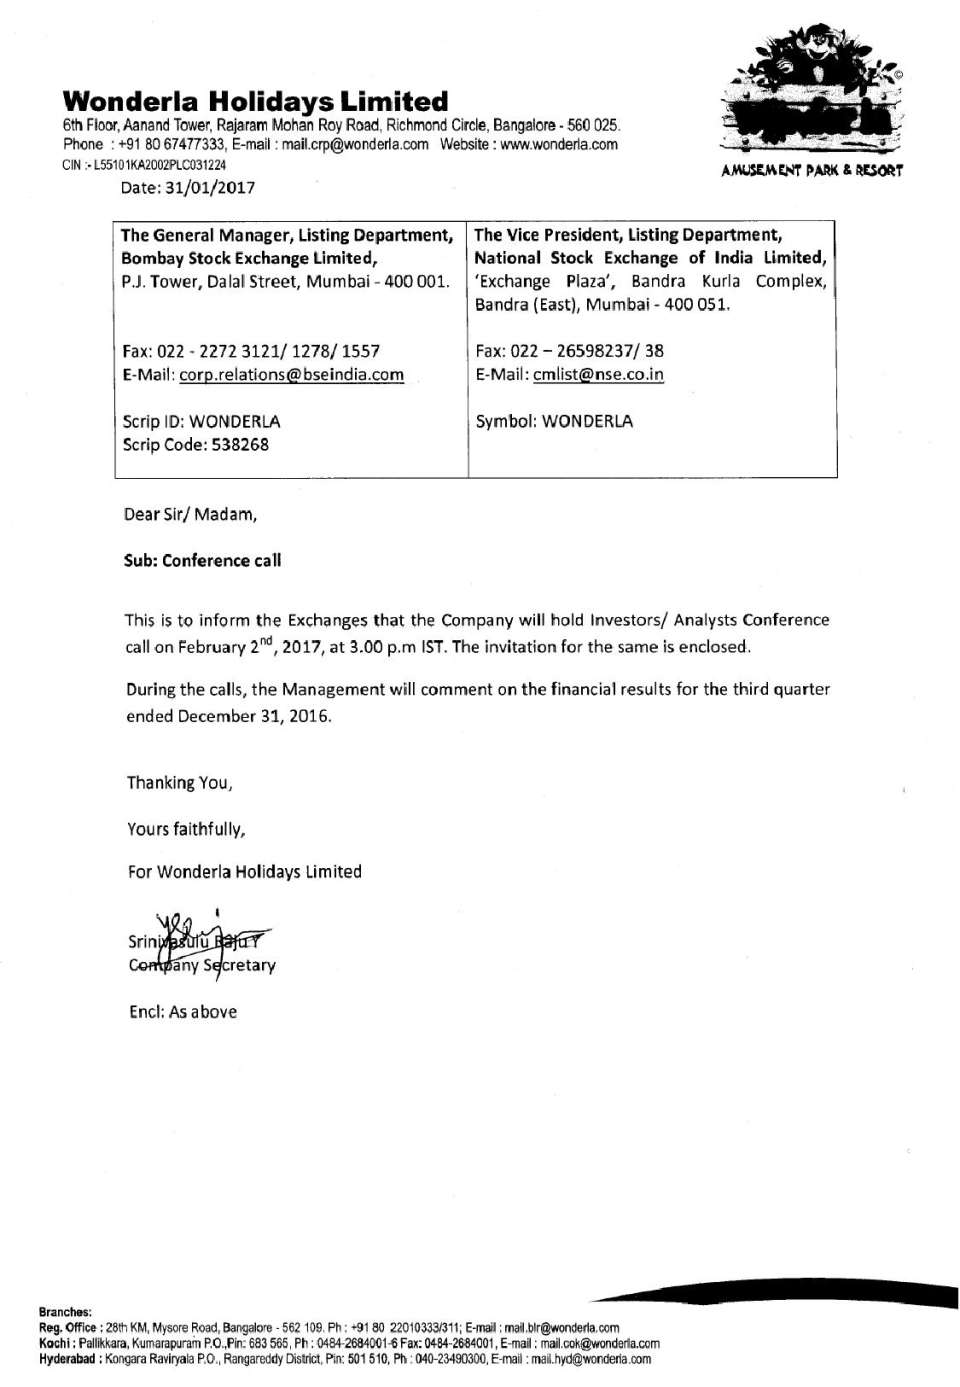 Wonderla Amusement Parks & Resort  Conference Call Notice-page-001